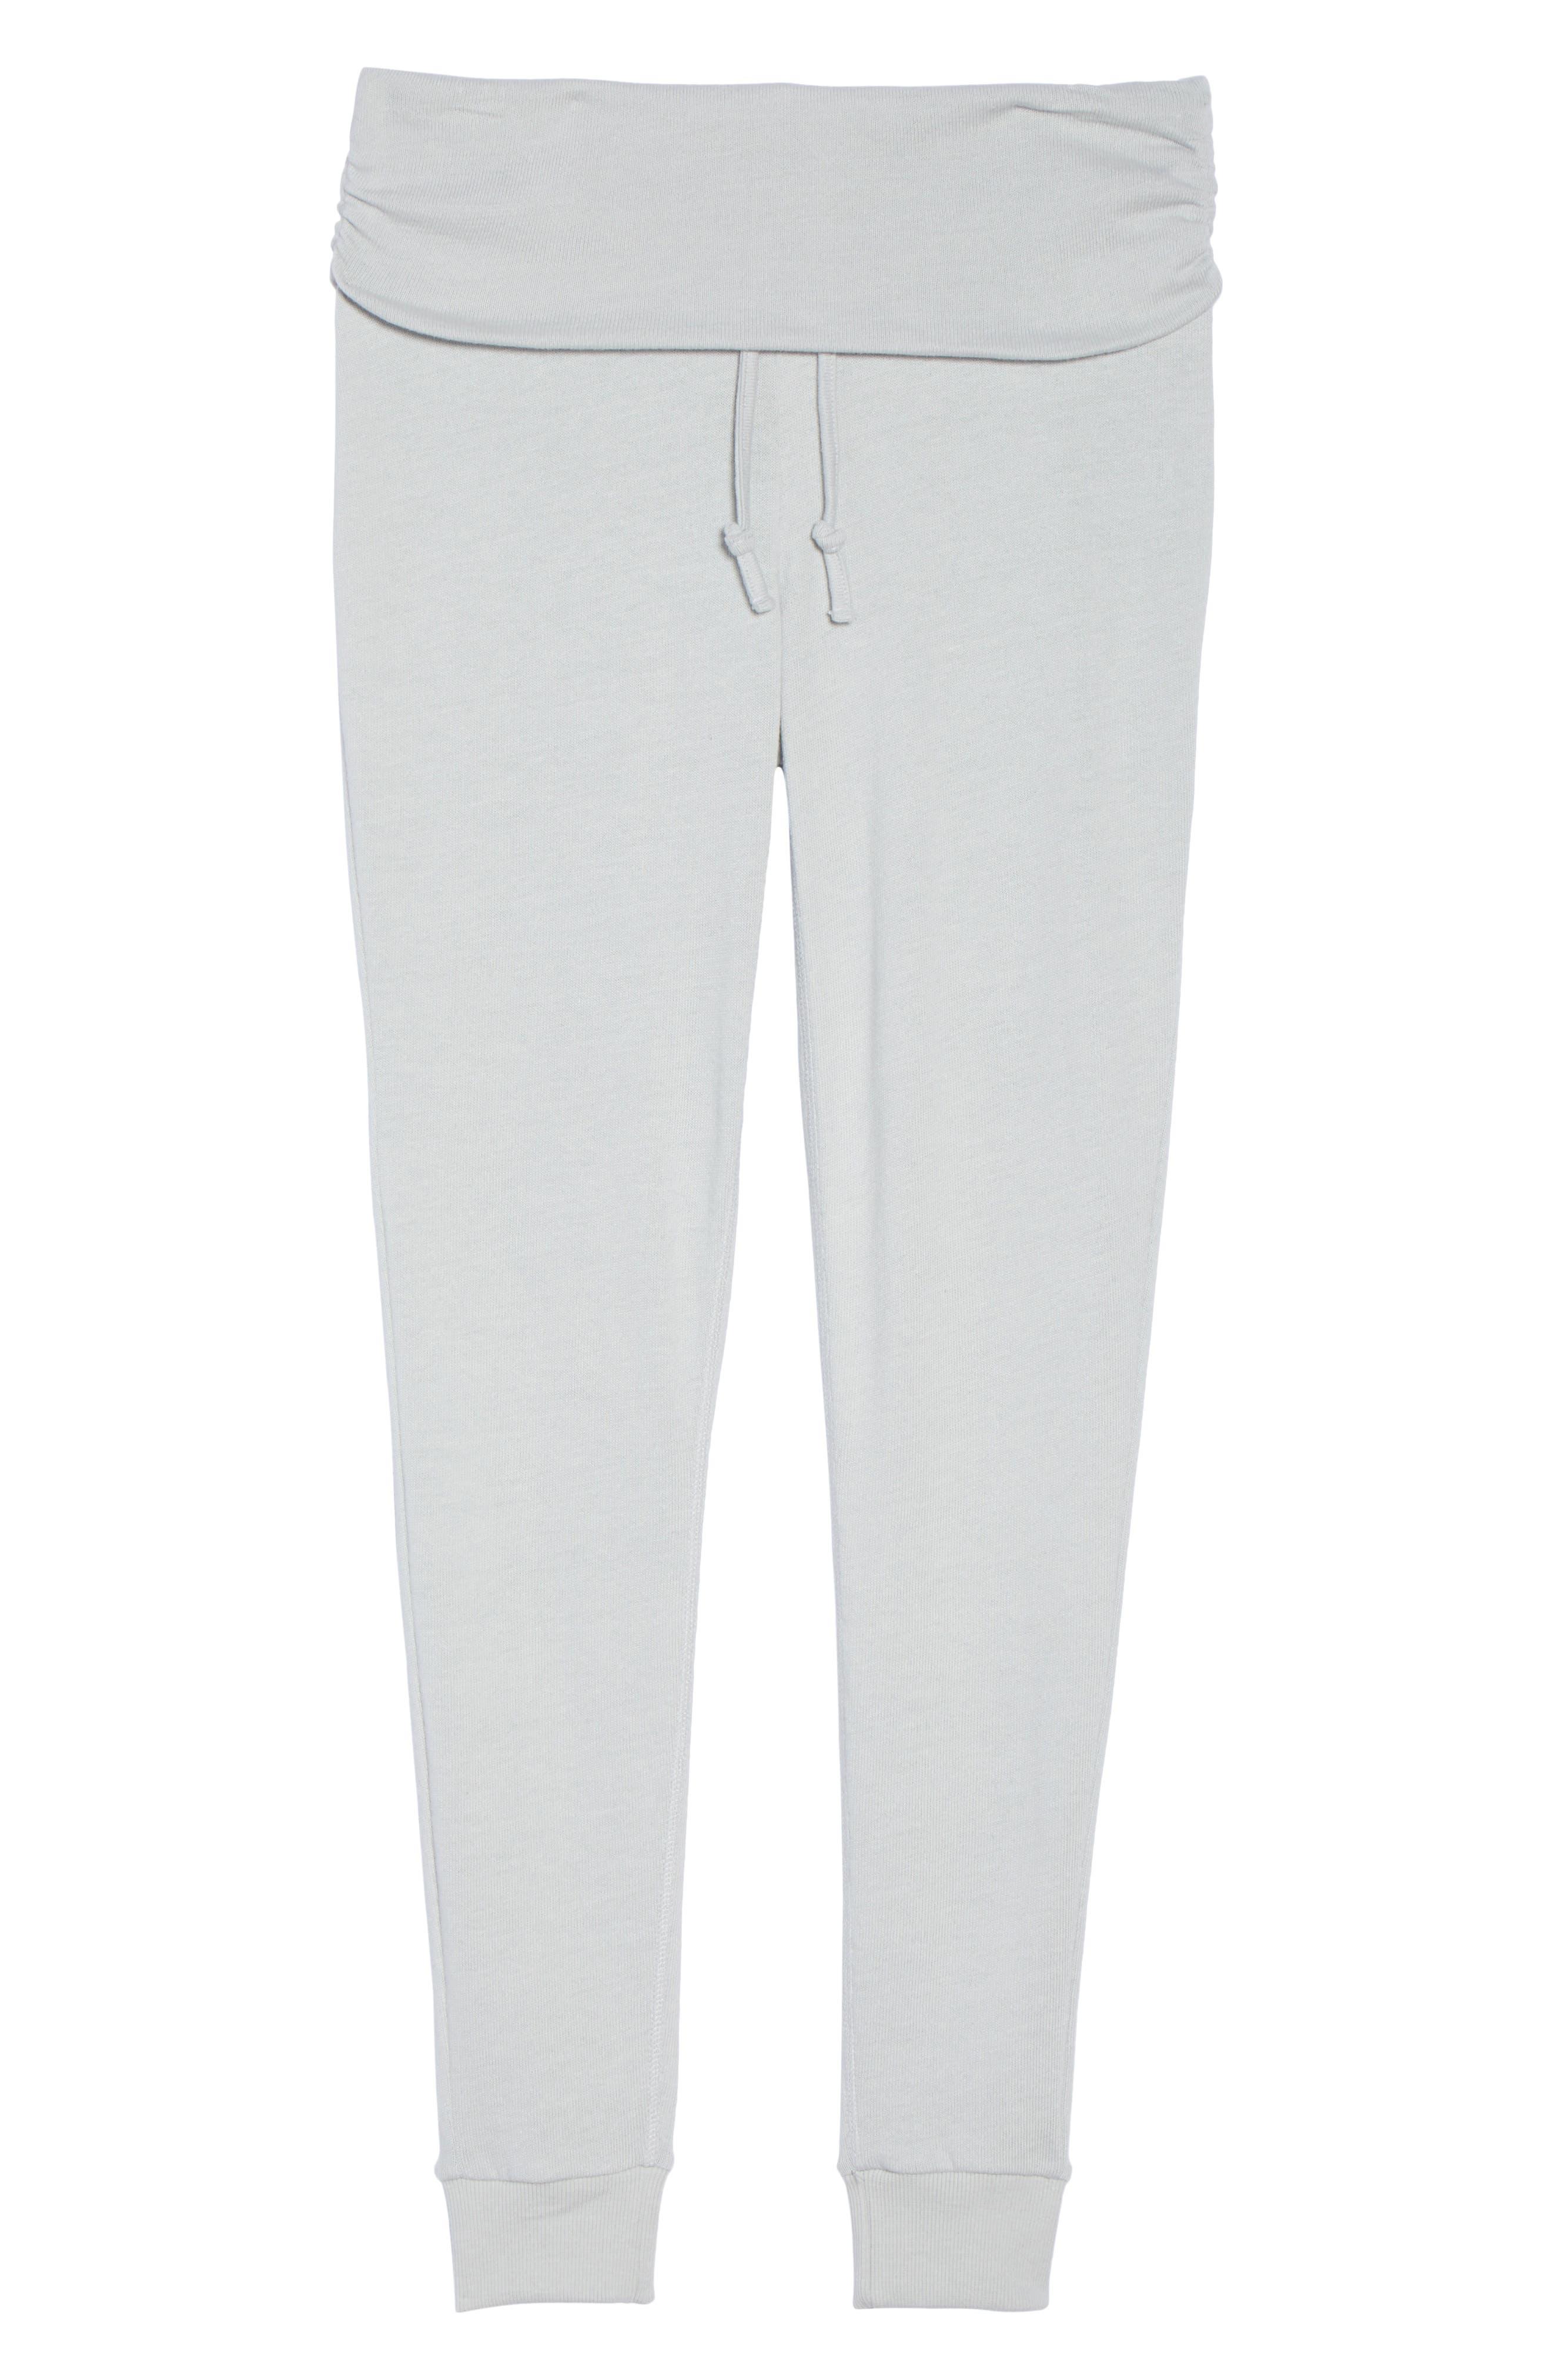 Slow Jogger Pants,                             Alternate thumbnail 4, color,                             Light Grey